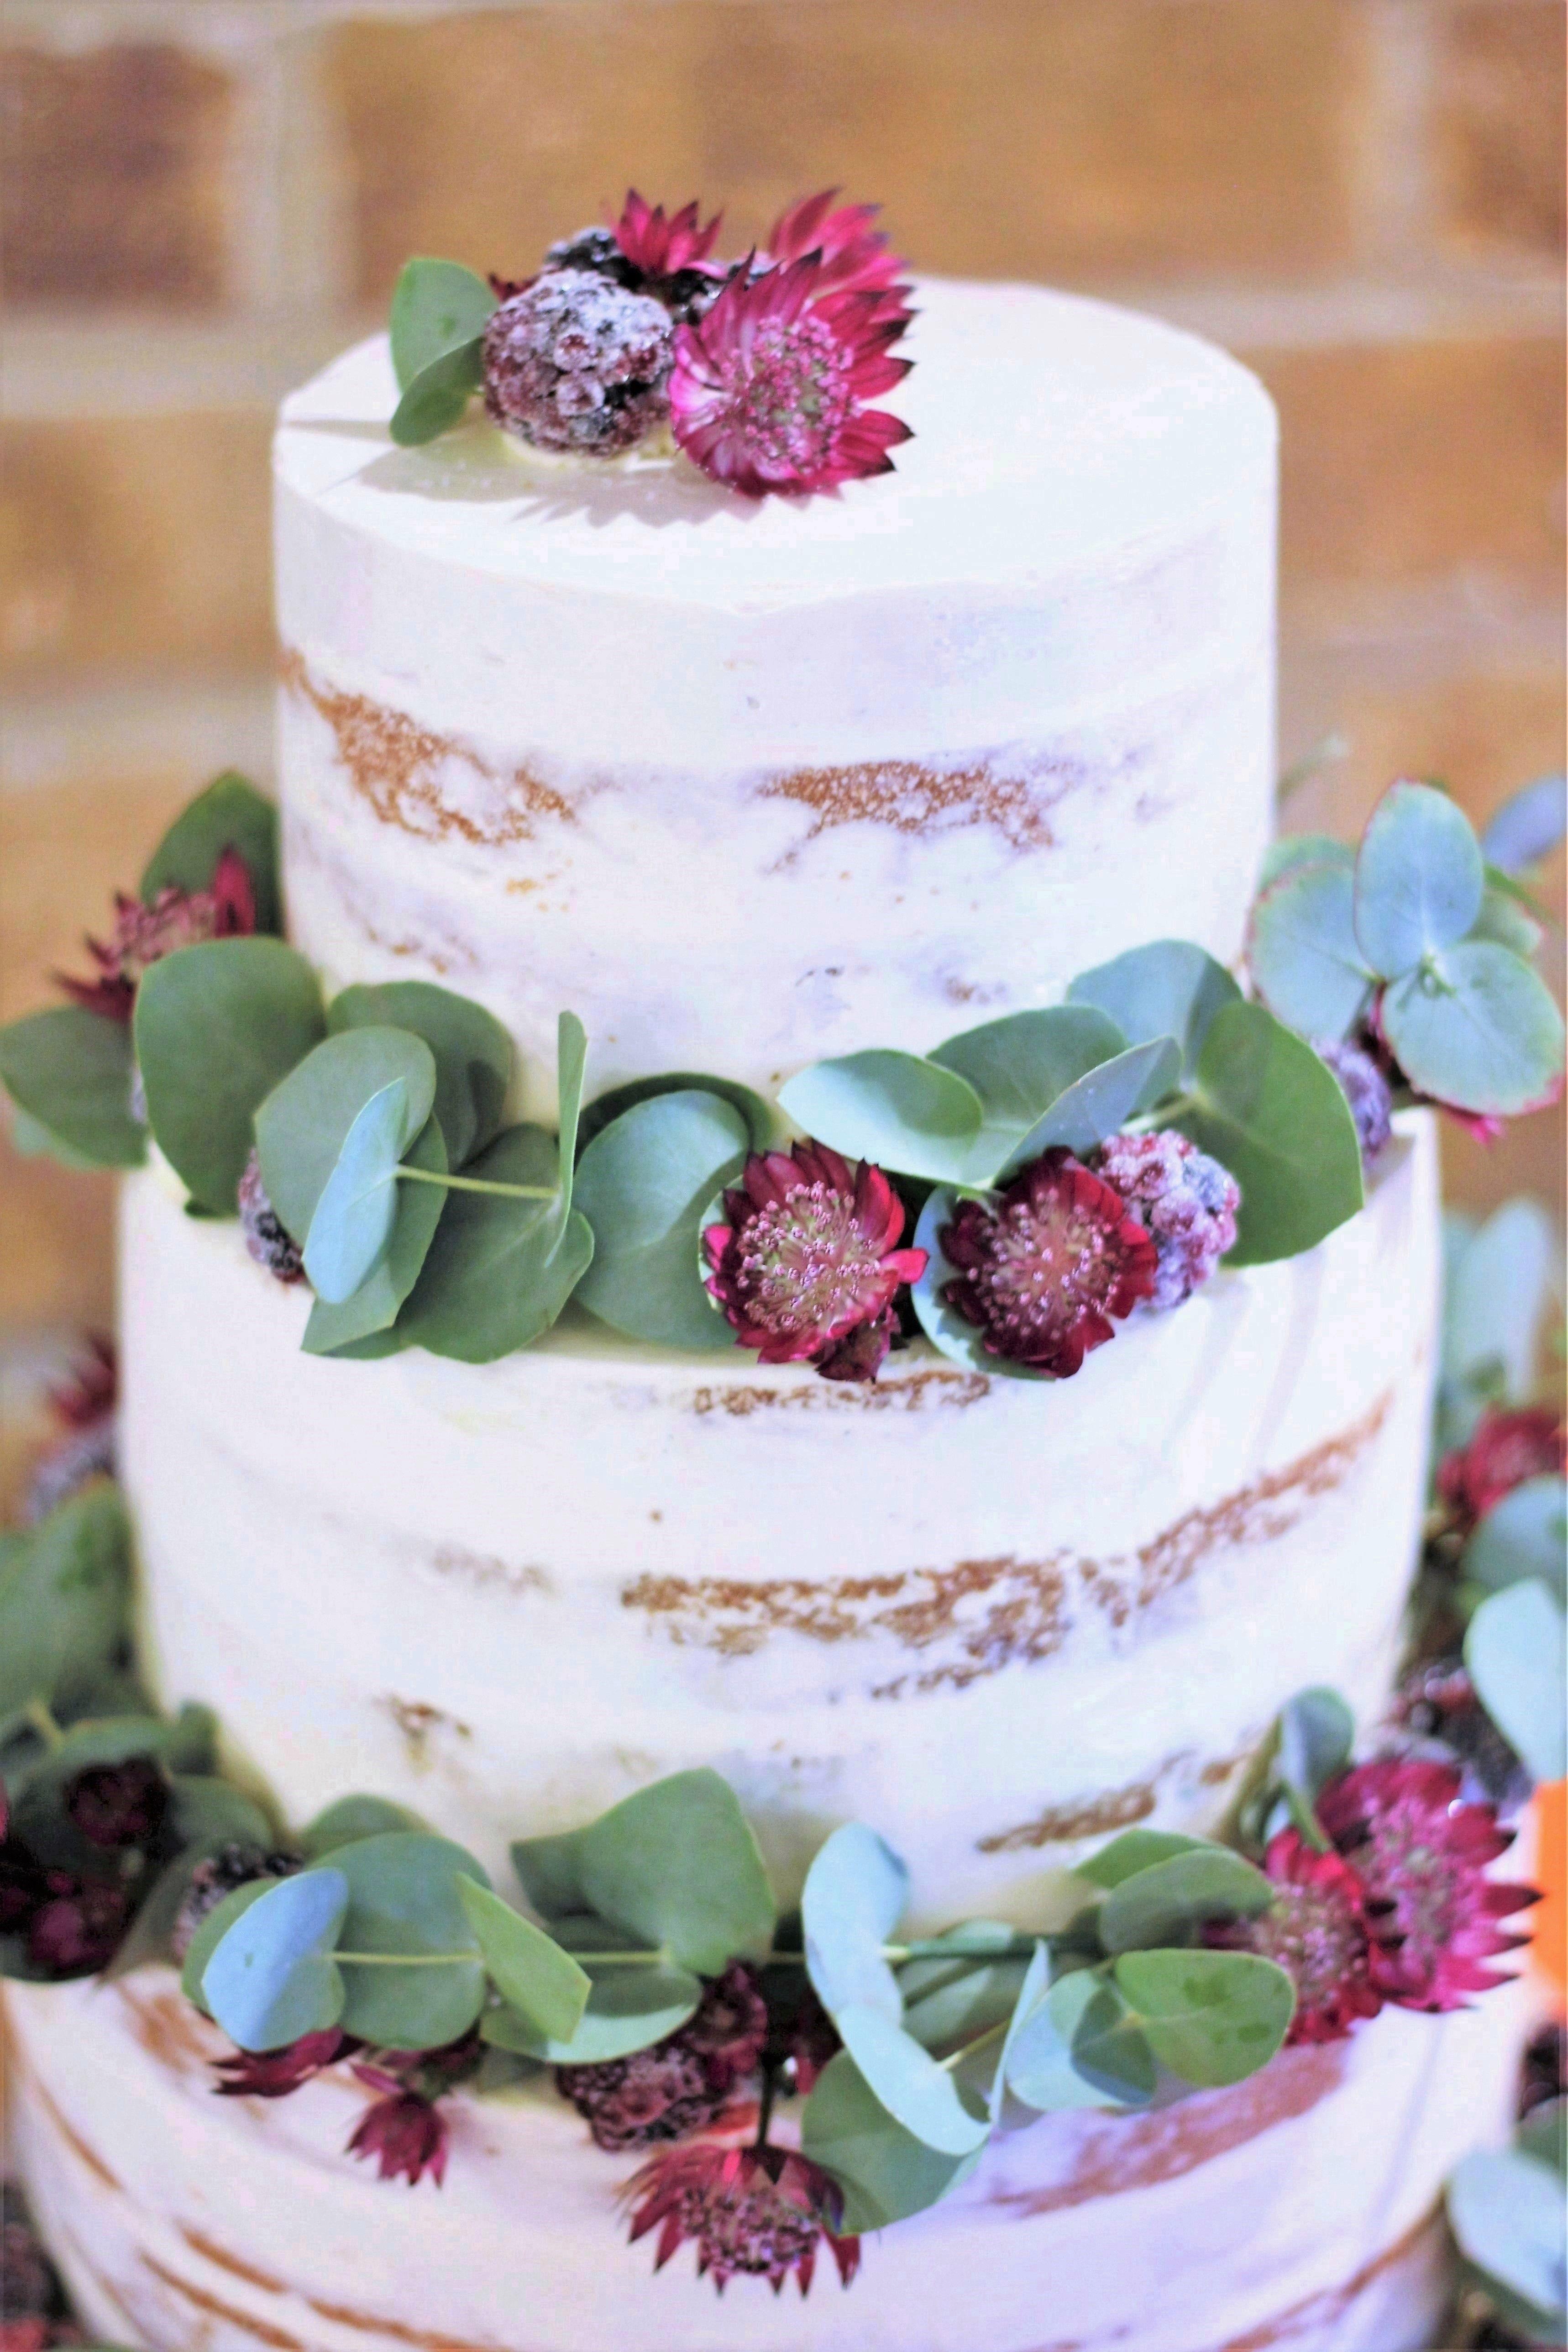 14dfeb377cb Autumnal 3-tier semi-naked wedding cake - Victoria sponge   carrot cake  tiers with Swiss meringue buttercream